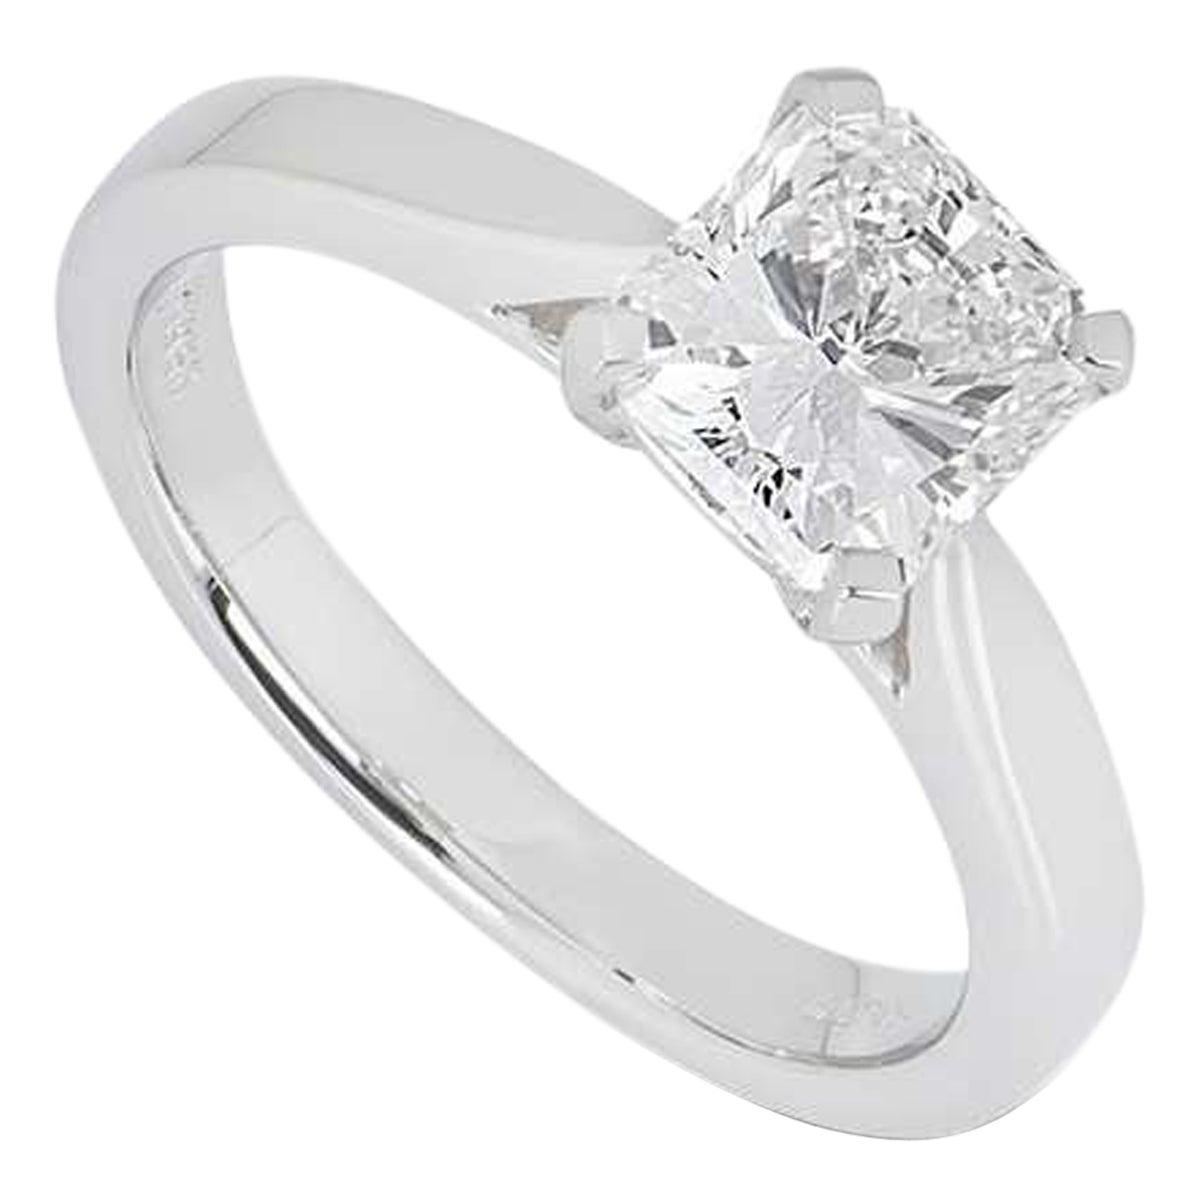 GIA Certified Platinum Radiant Cut Diamond Engagement Ring 1.51 Carat G/VS2